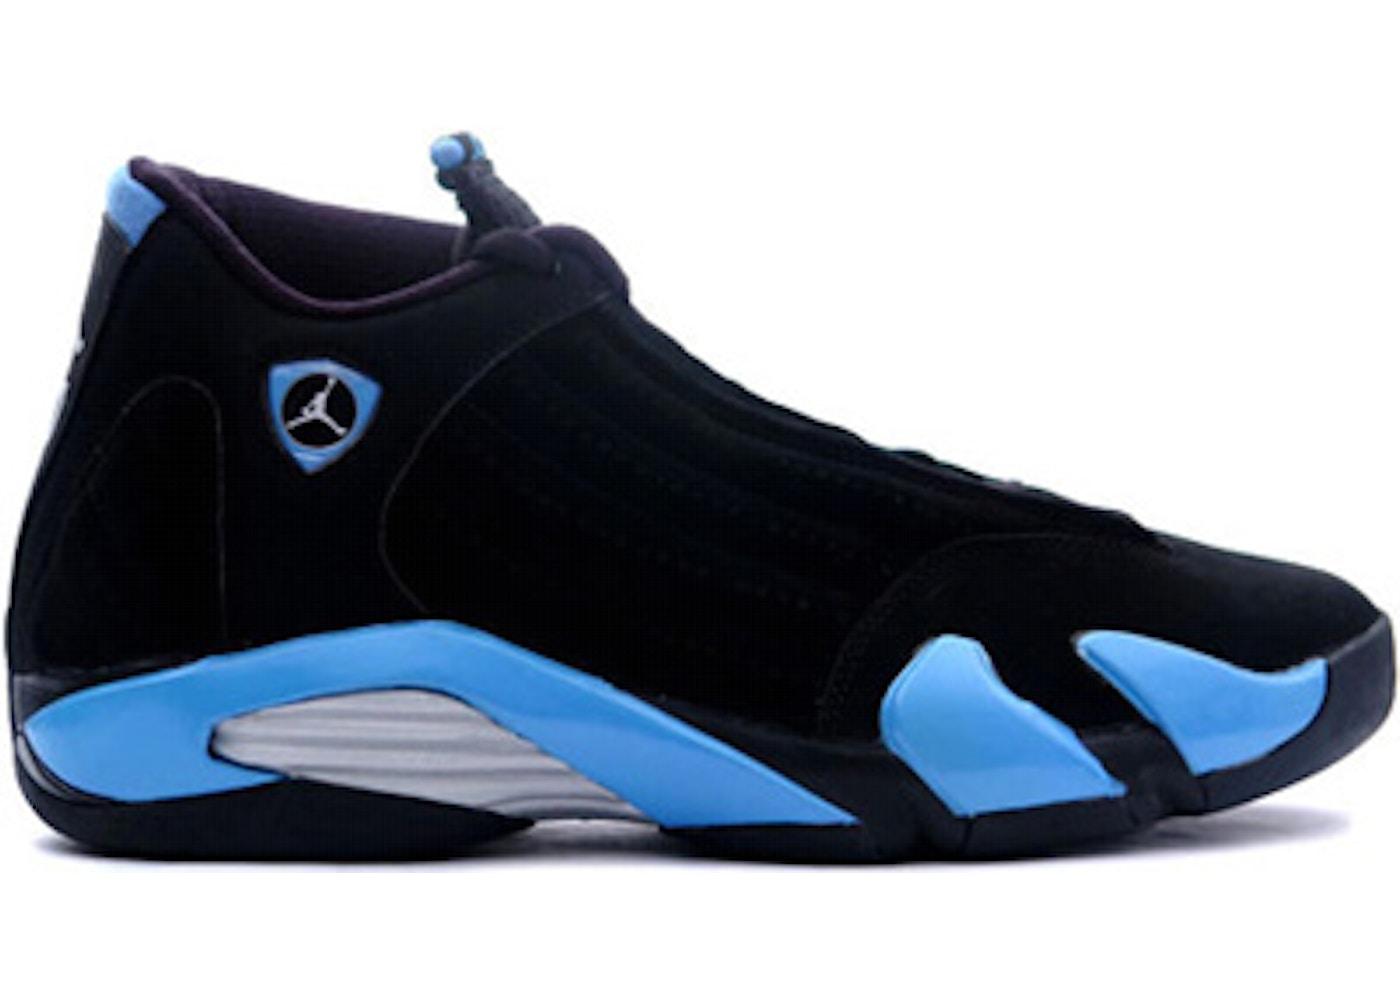 watch 7e5d6 6a0e6 Buy Air Jordan 14 Size 16 Shoes & Deadstock Sneakers